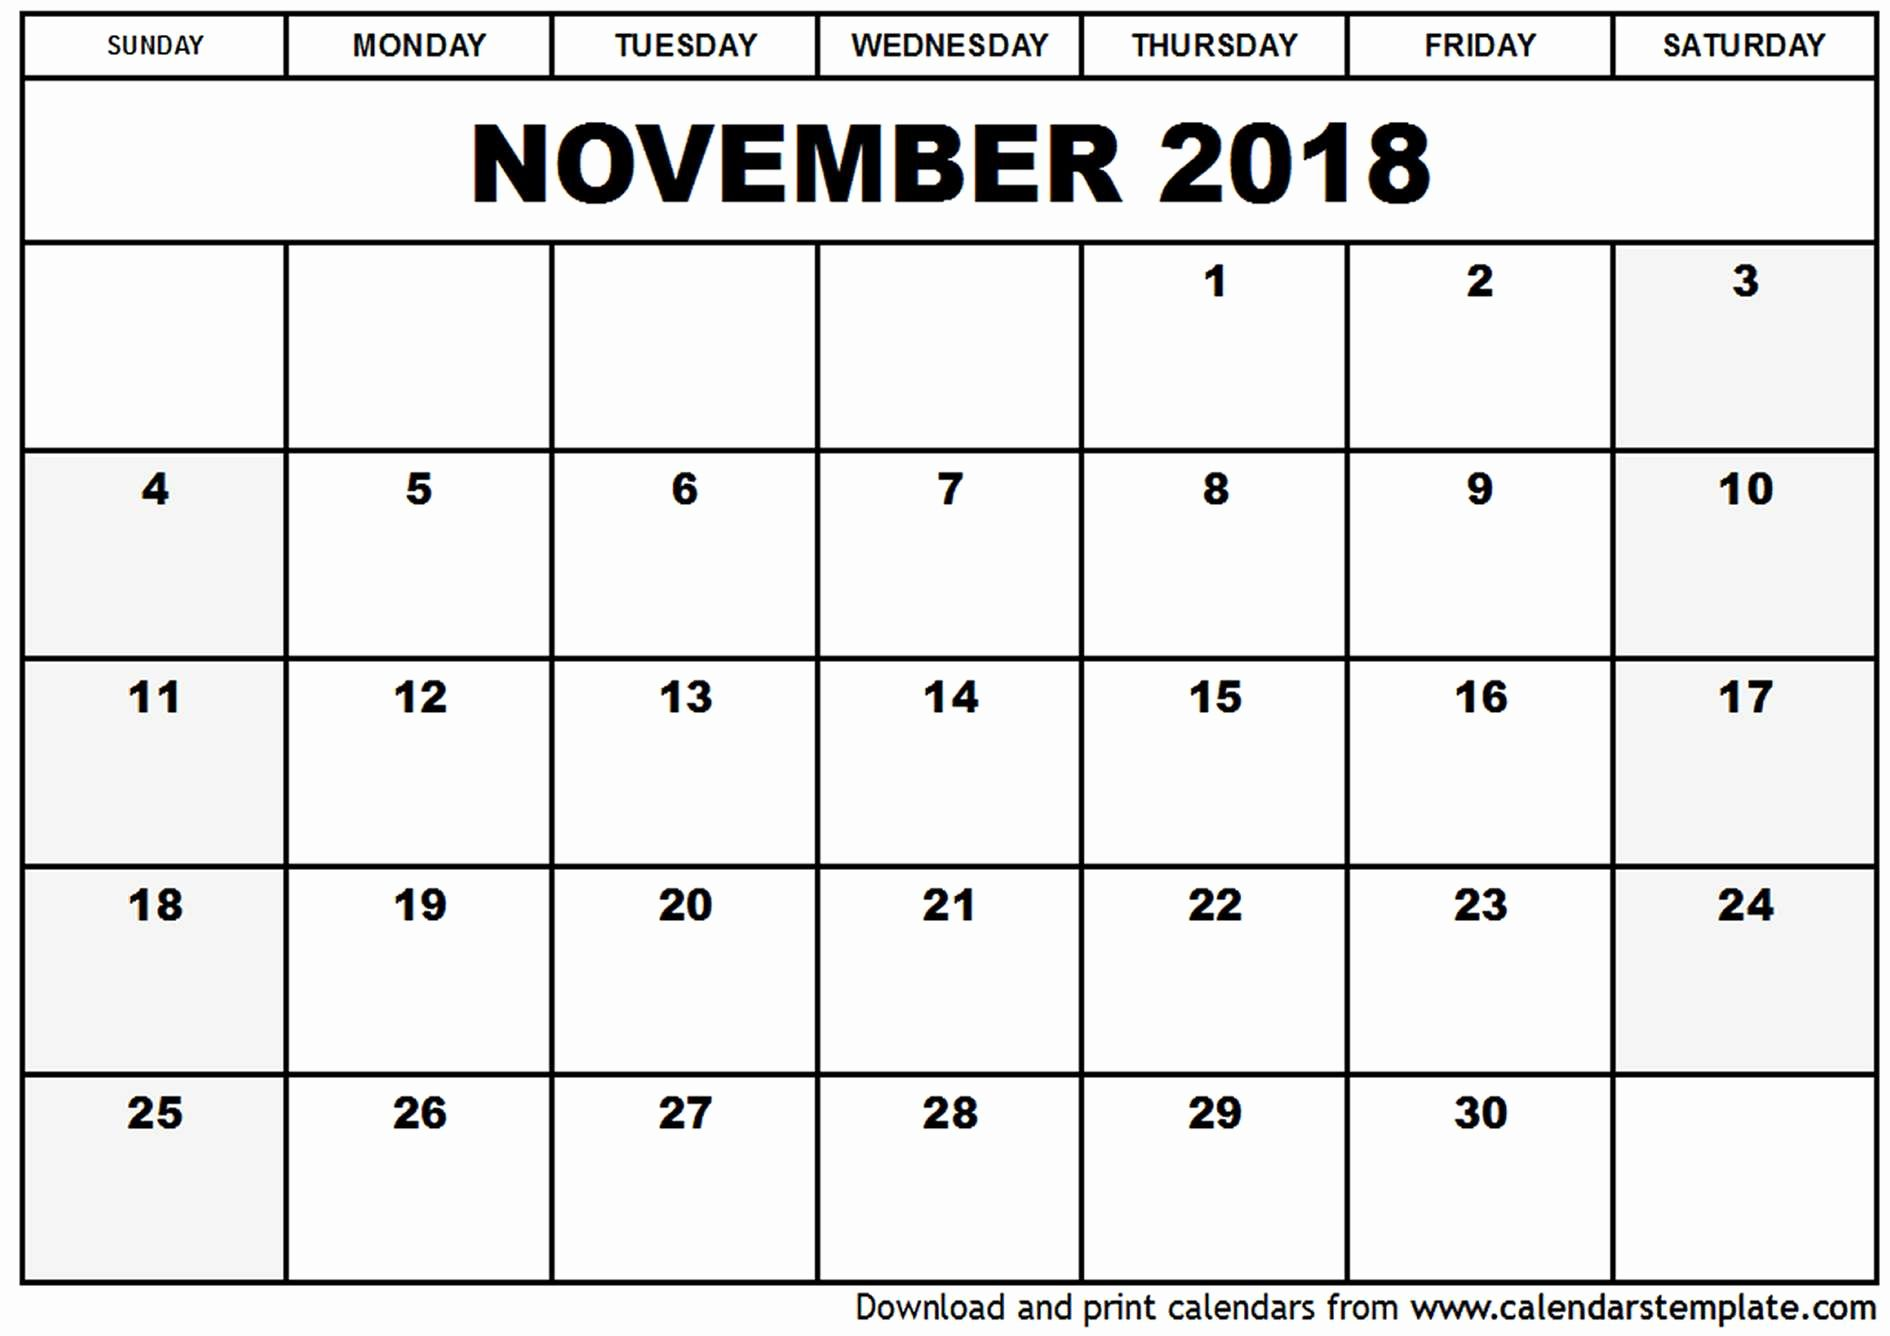 November 2018 Calendar Template Printable November Calendar 2018